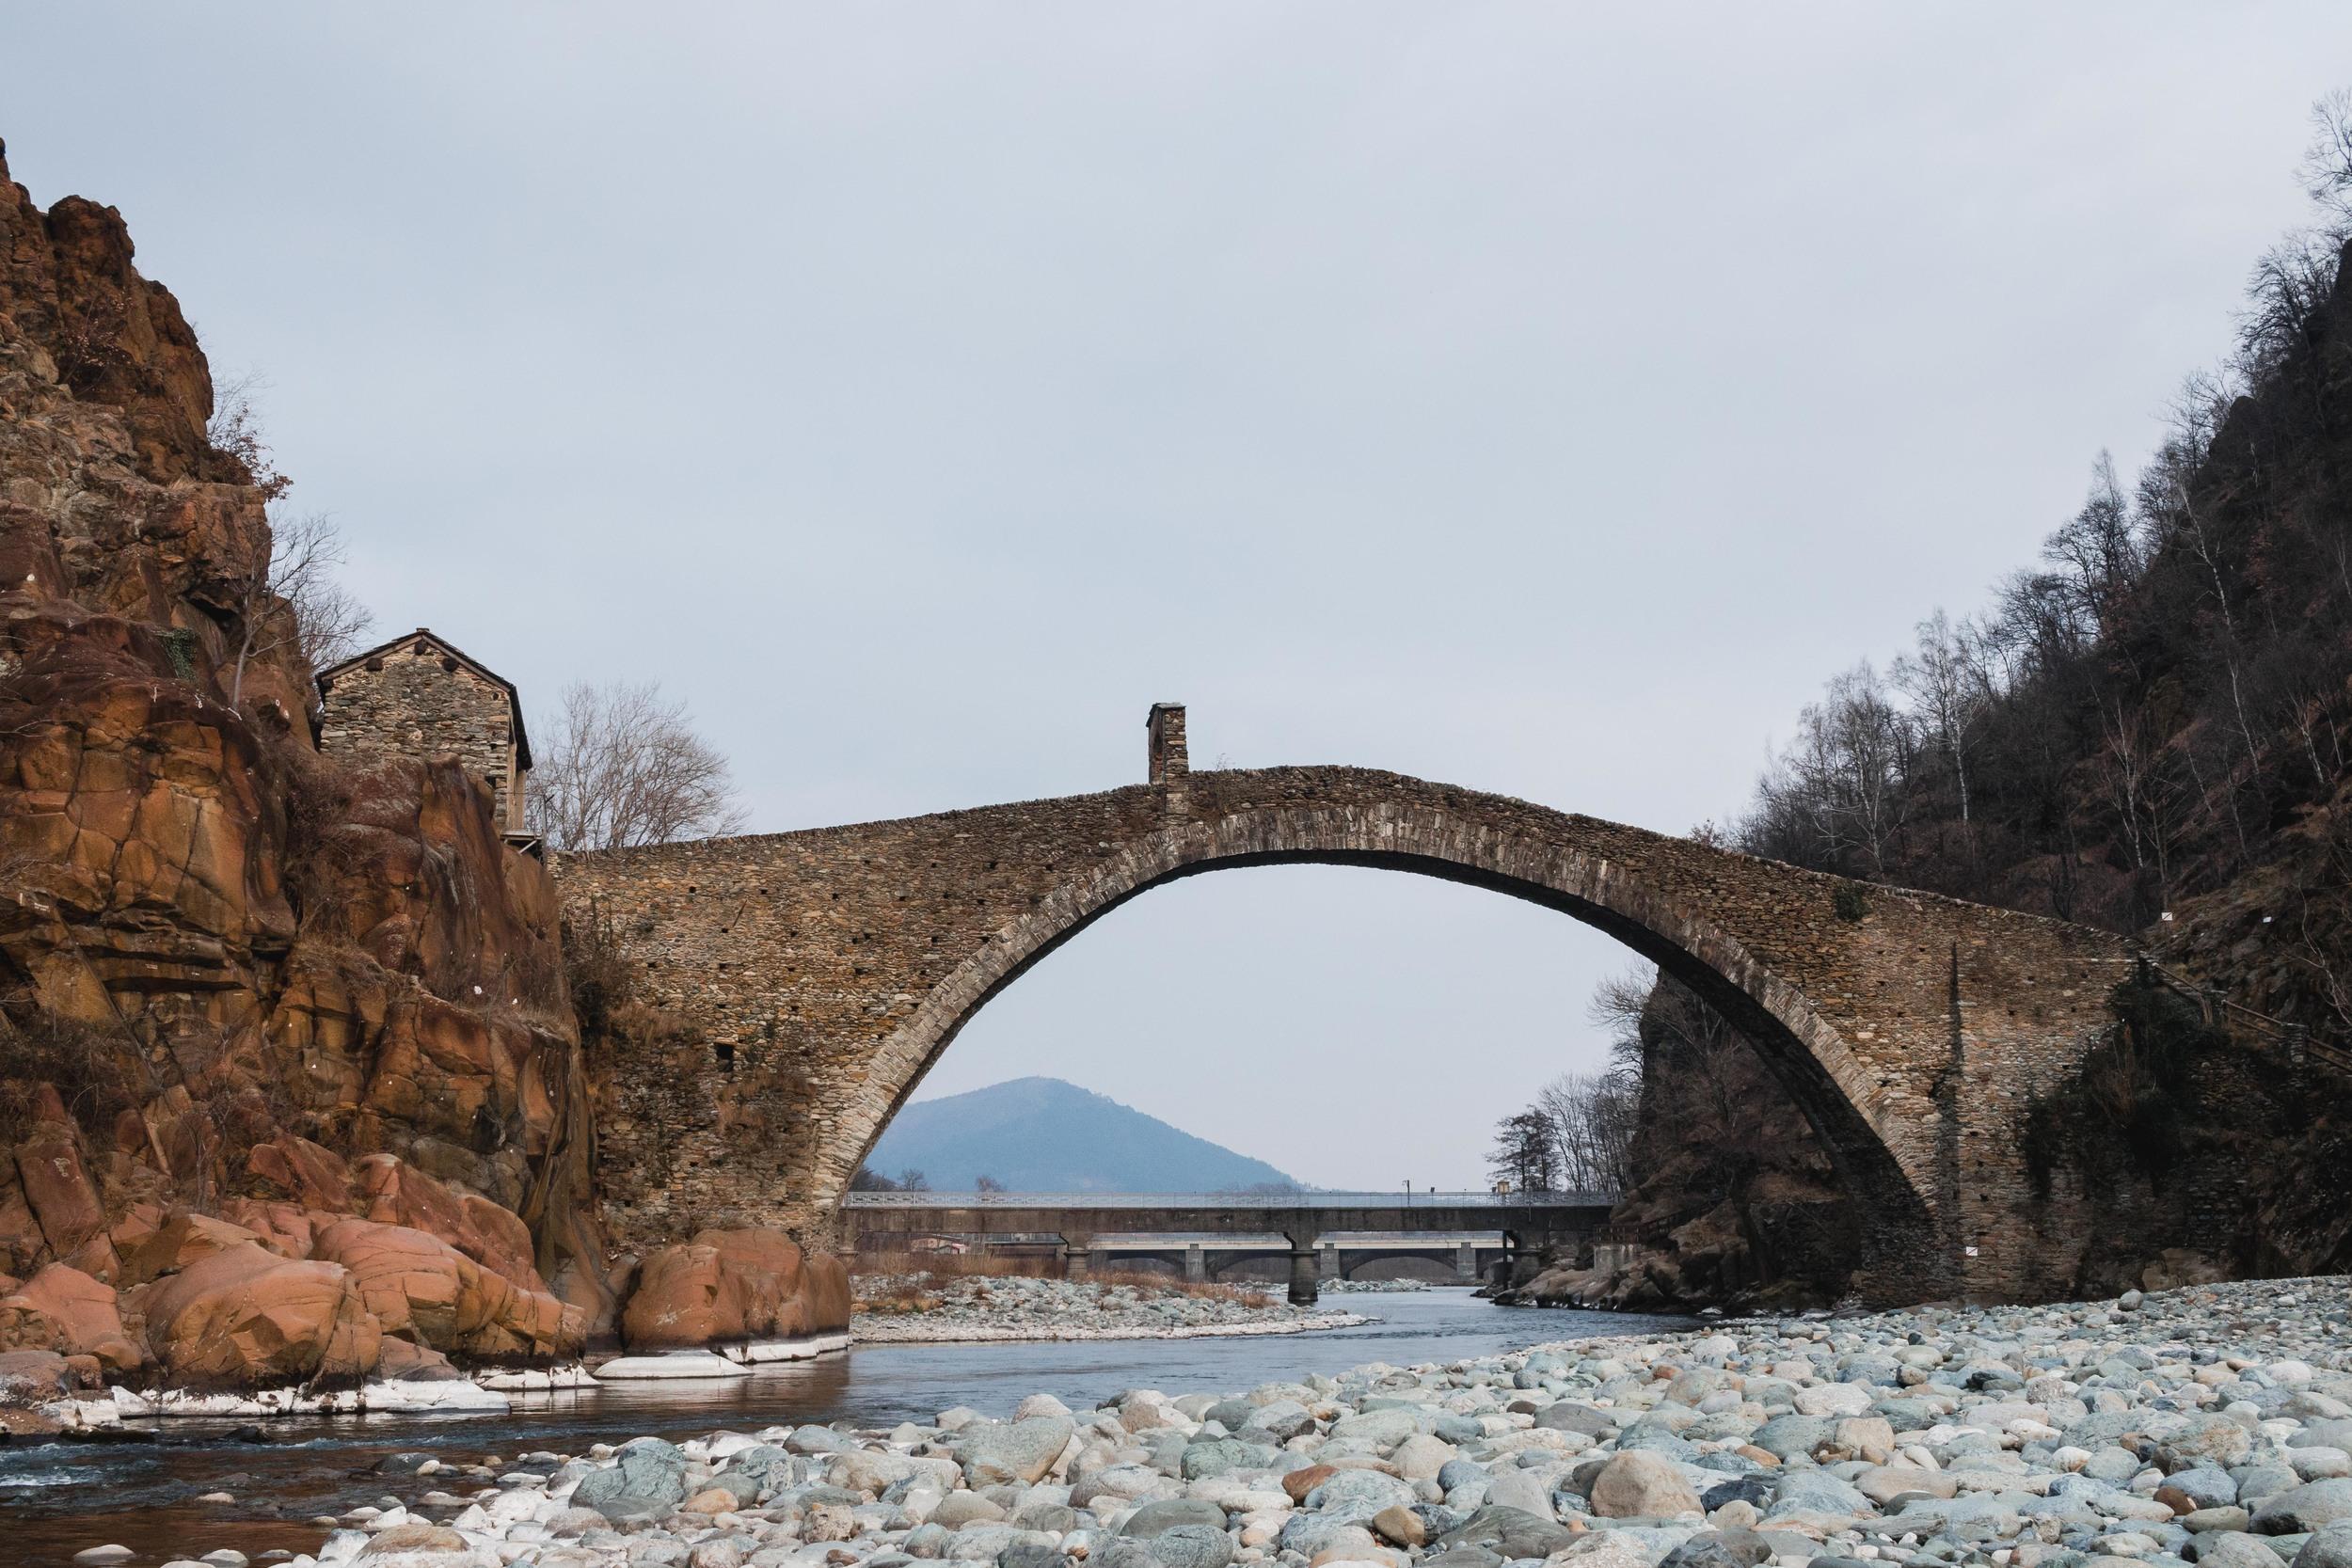 Ponte del diavolo Torino italia Turin italy devils bridge